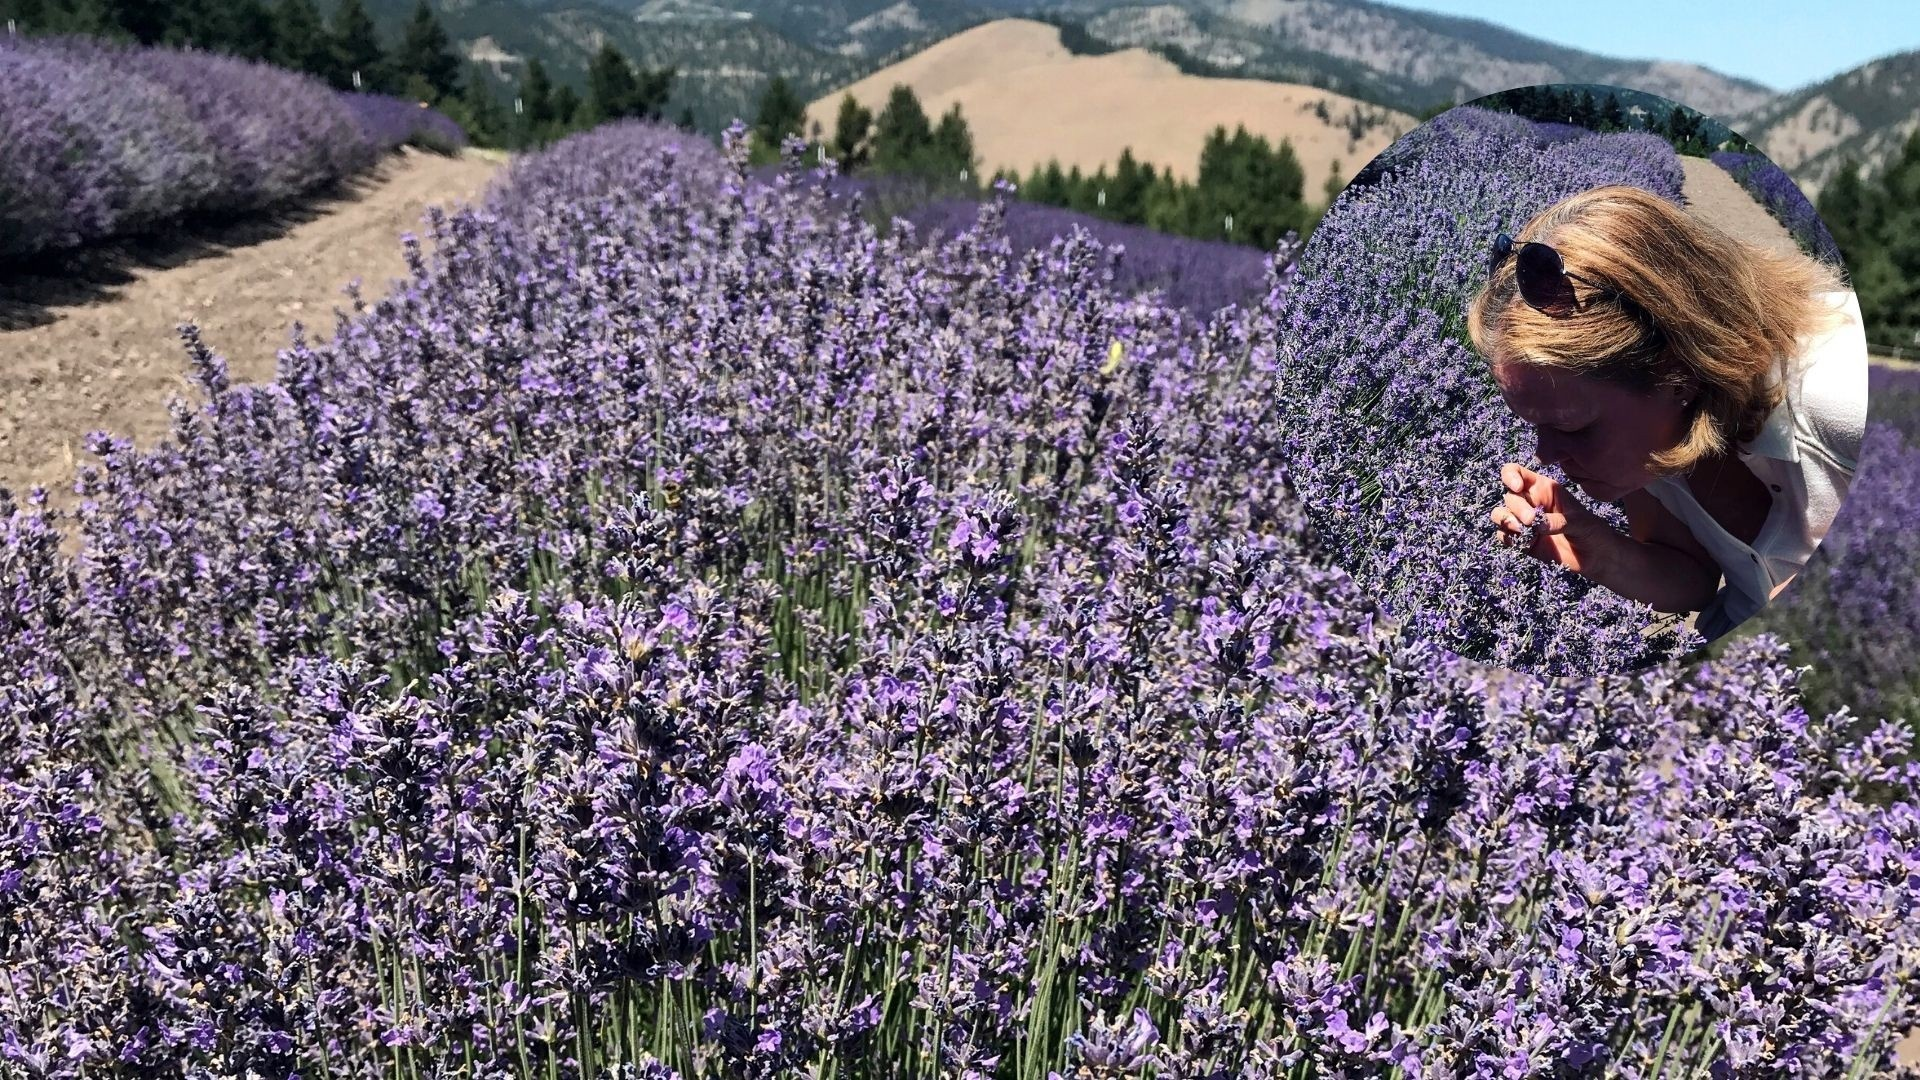 Frauke standing in a field of lavender with hands up feeling joyful